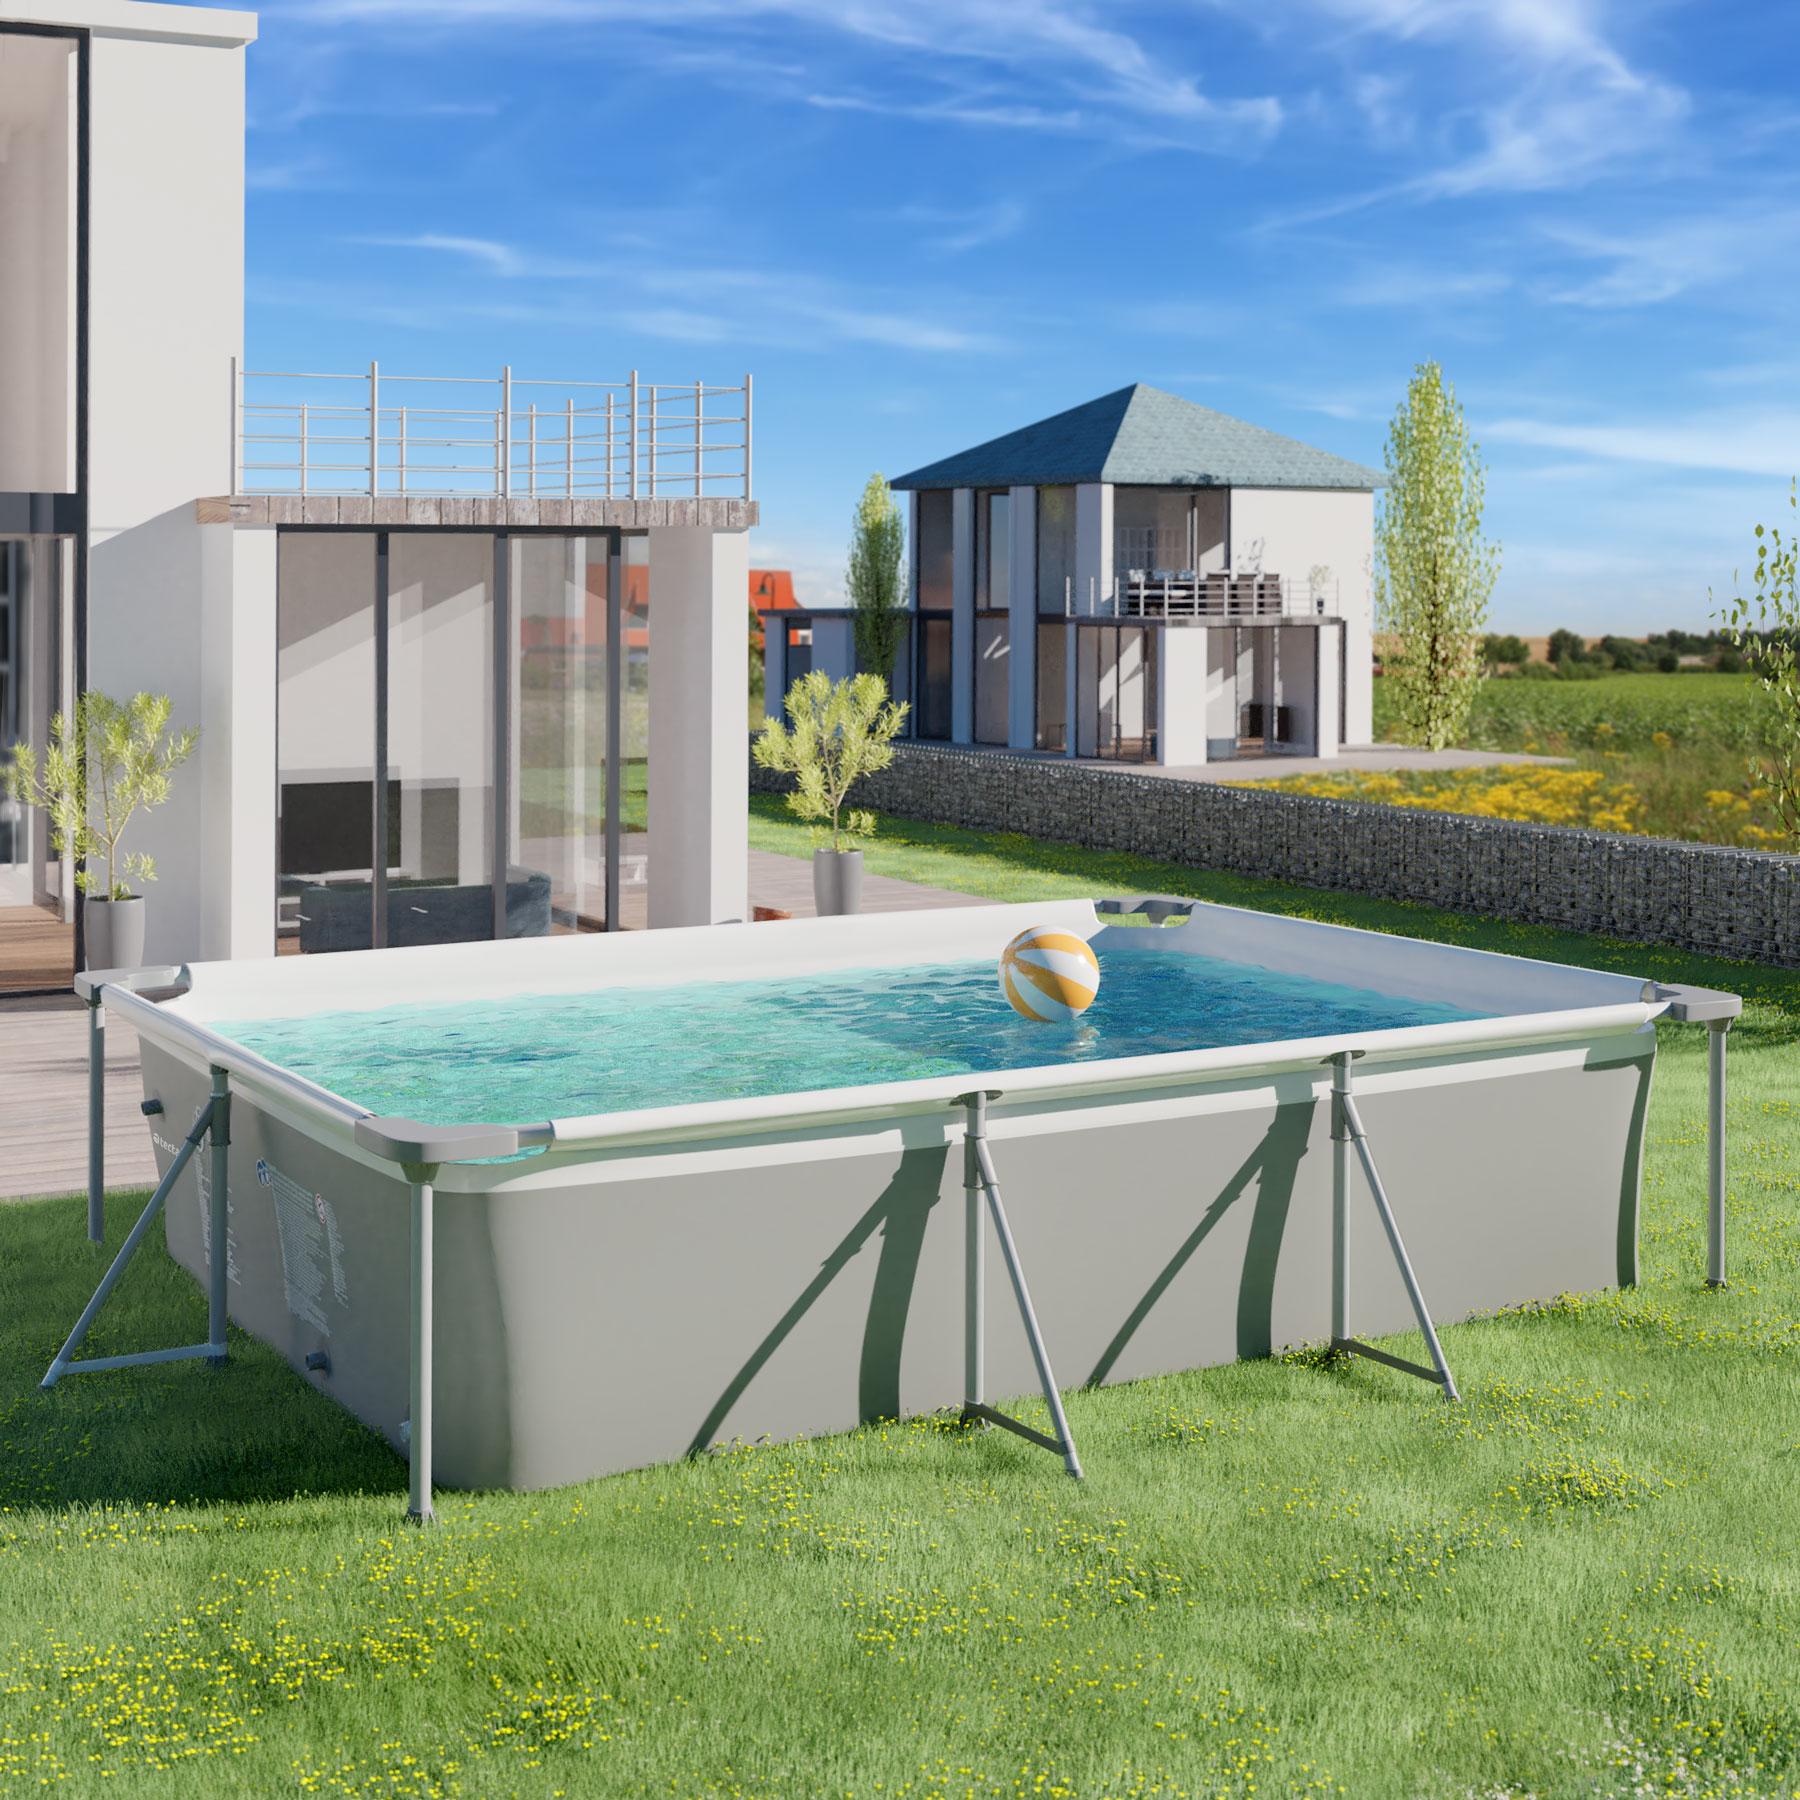 Swimming Pool Rectangular with Filter Pump 300x207x70cm Outdoor Garden Patio New